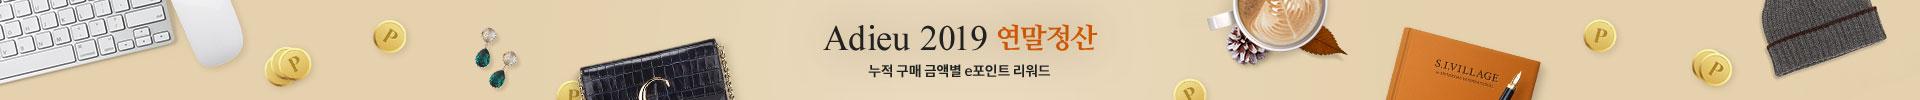 Adieu 2019 연말정산